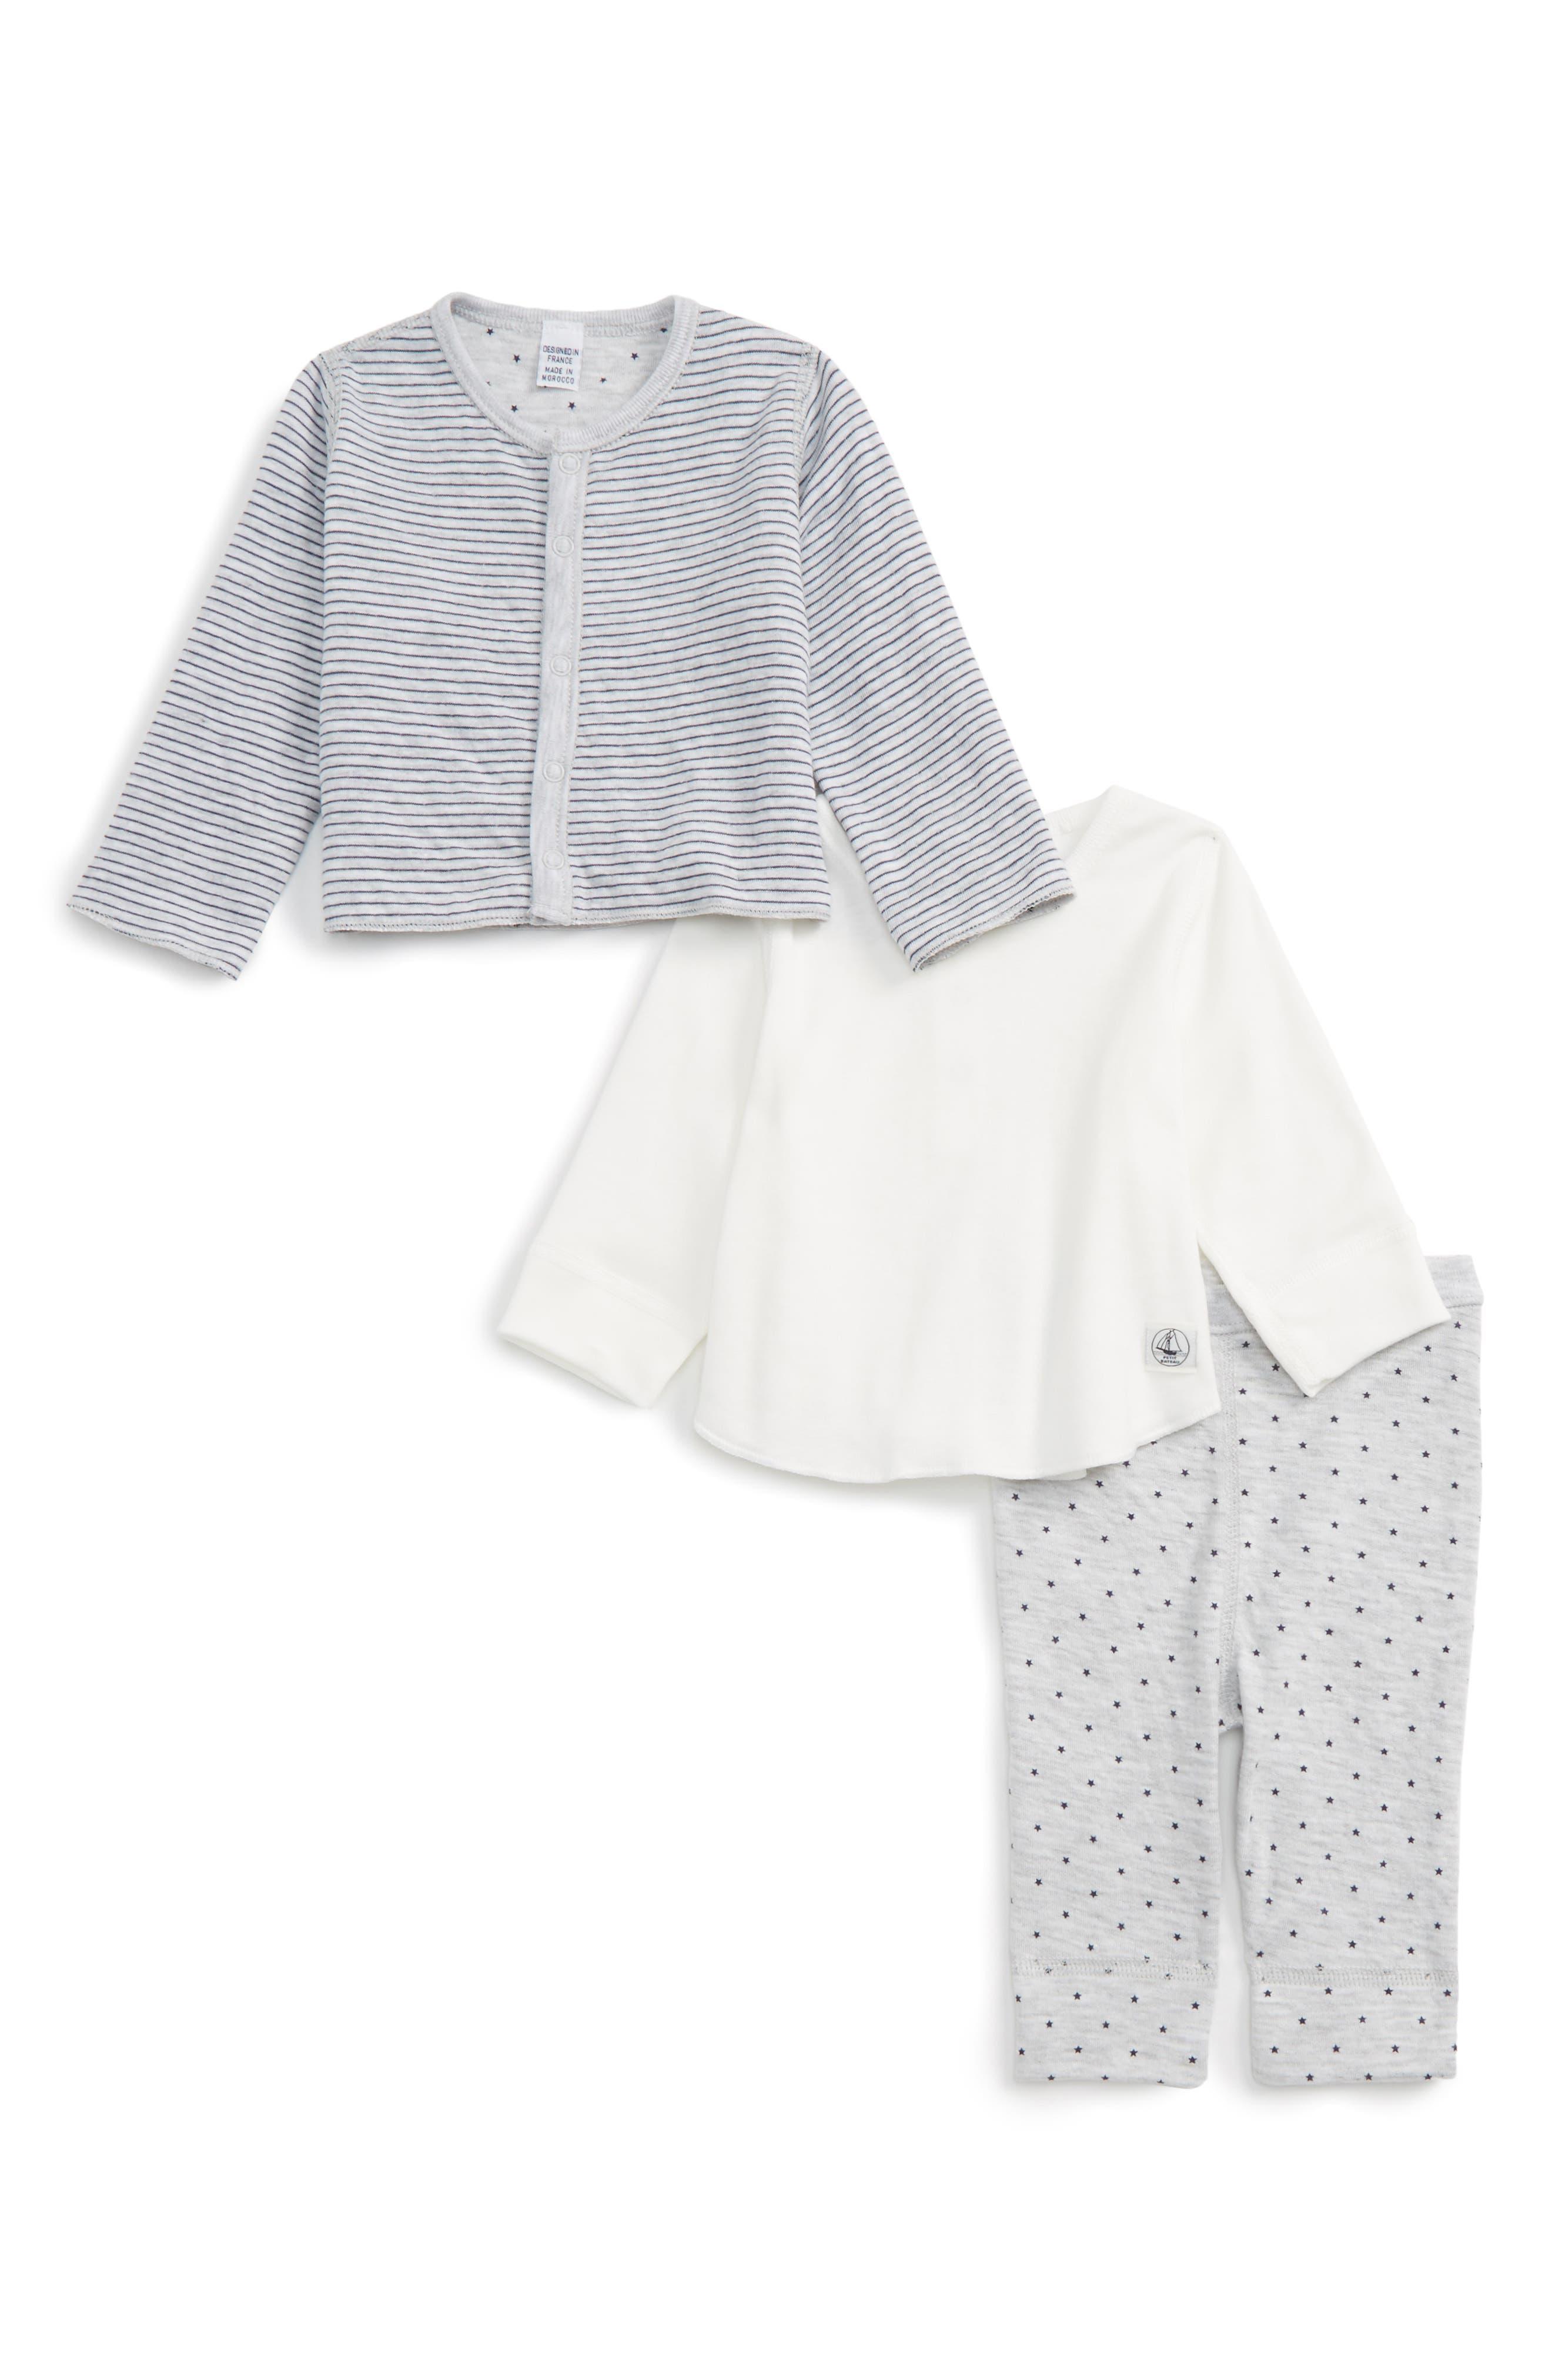 Alternate Image 1 Selected - Petit Bateau Jacket, Tee & Pants Set (Baby Girls)